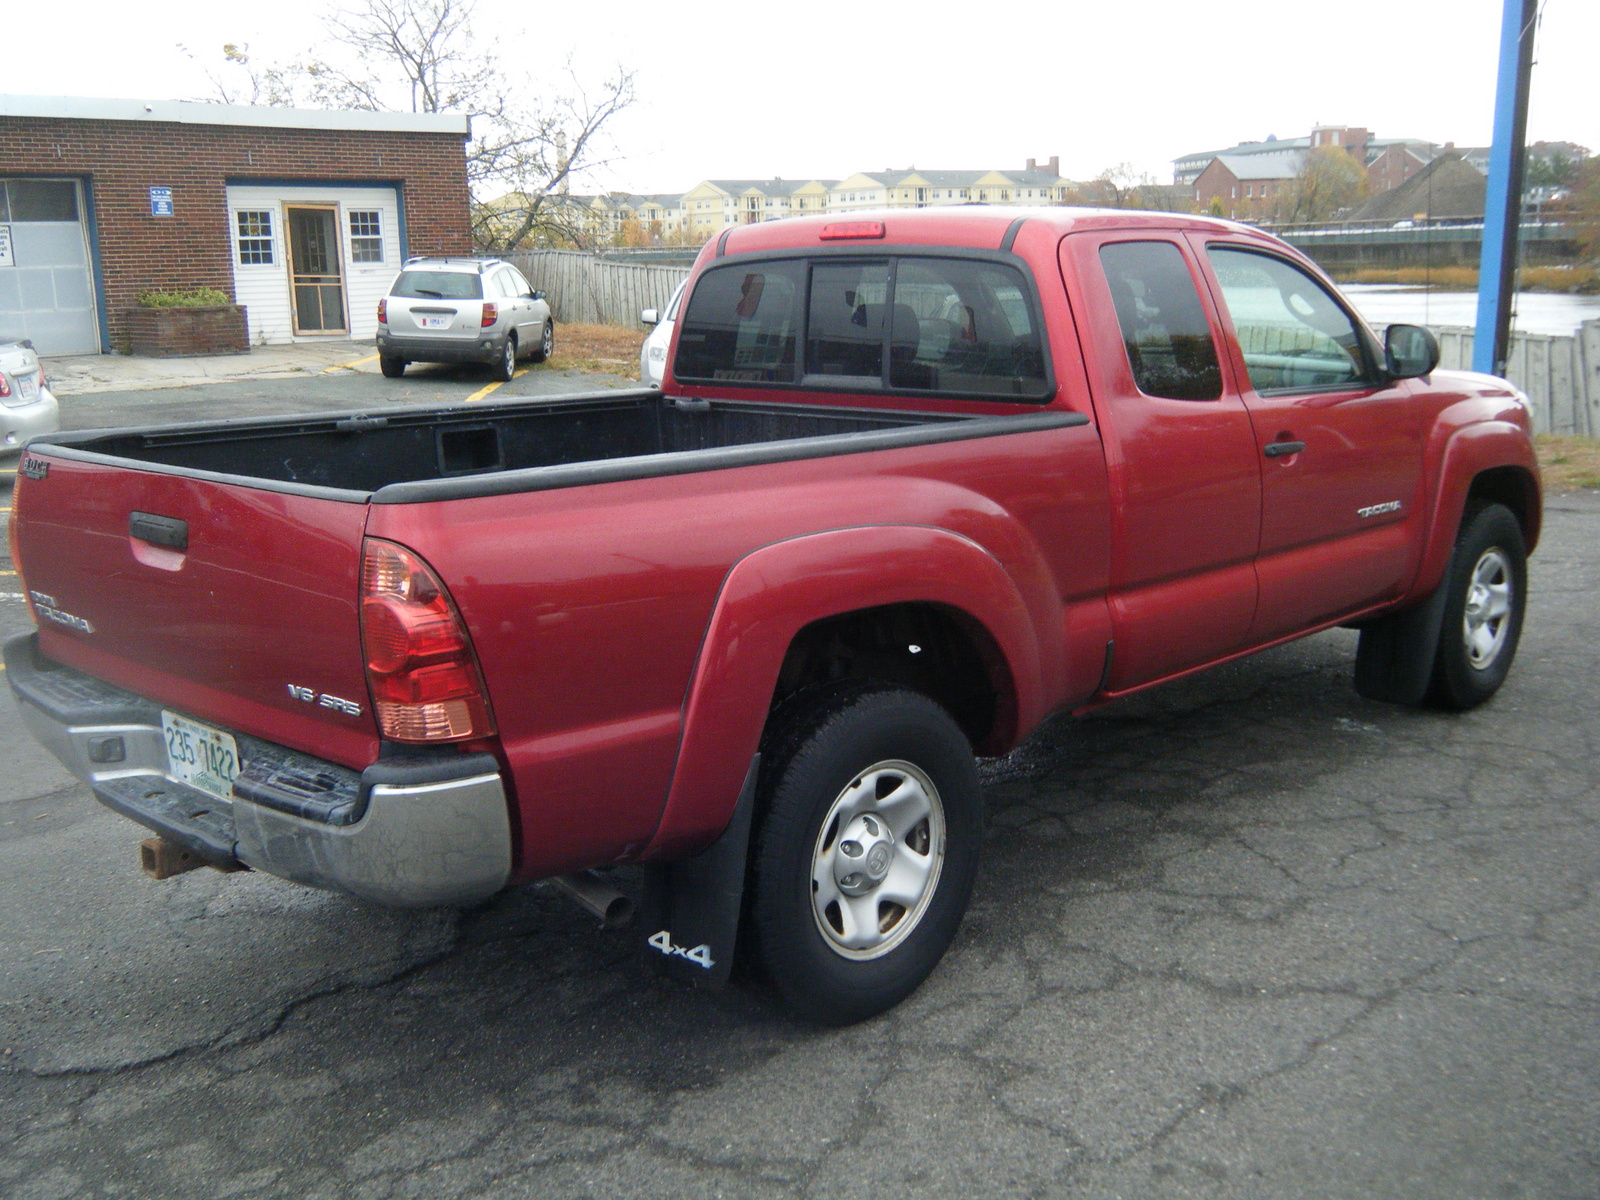 2007 Toyota Tacoma Pictures Cargurus